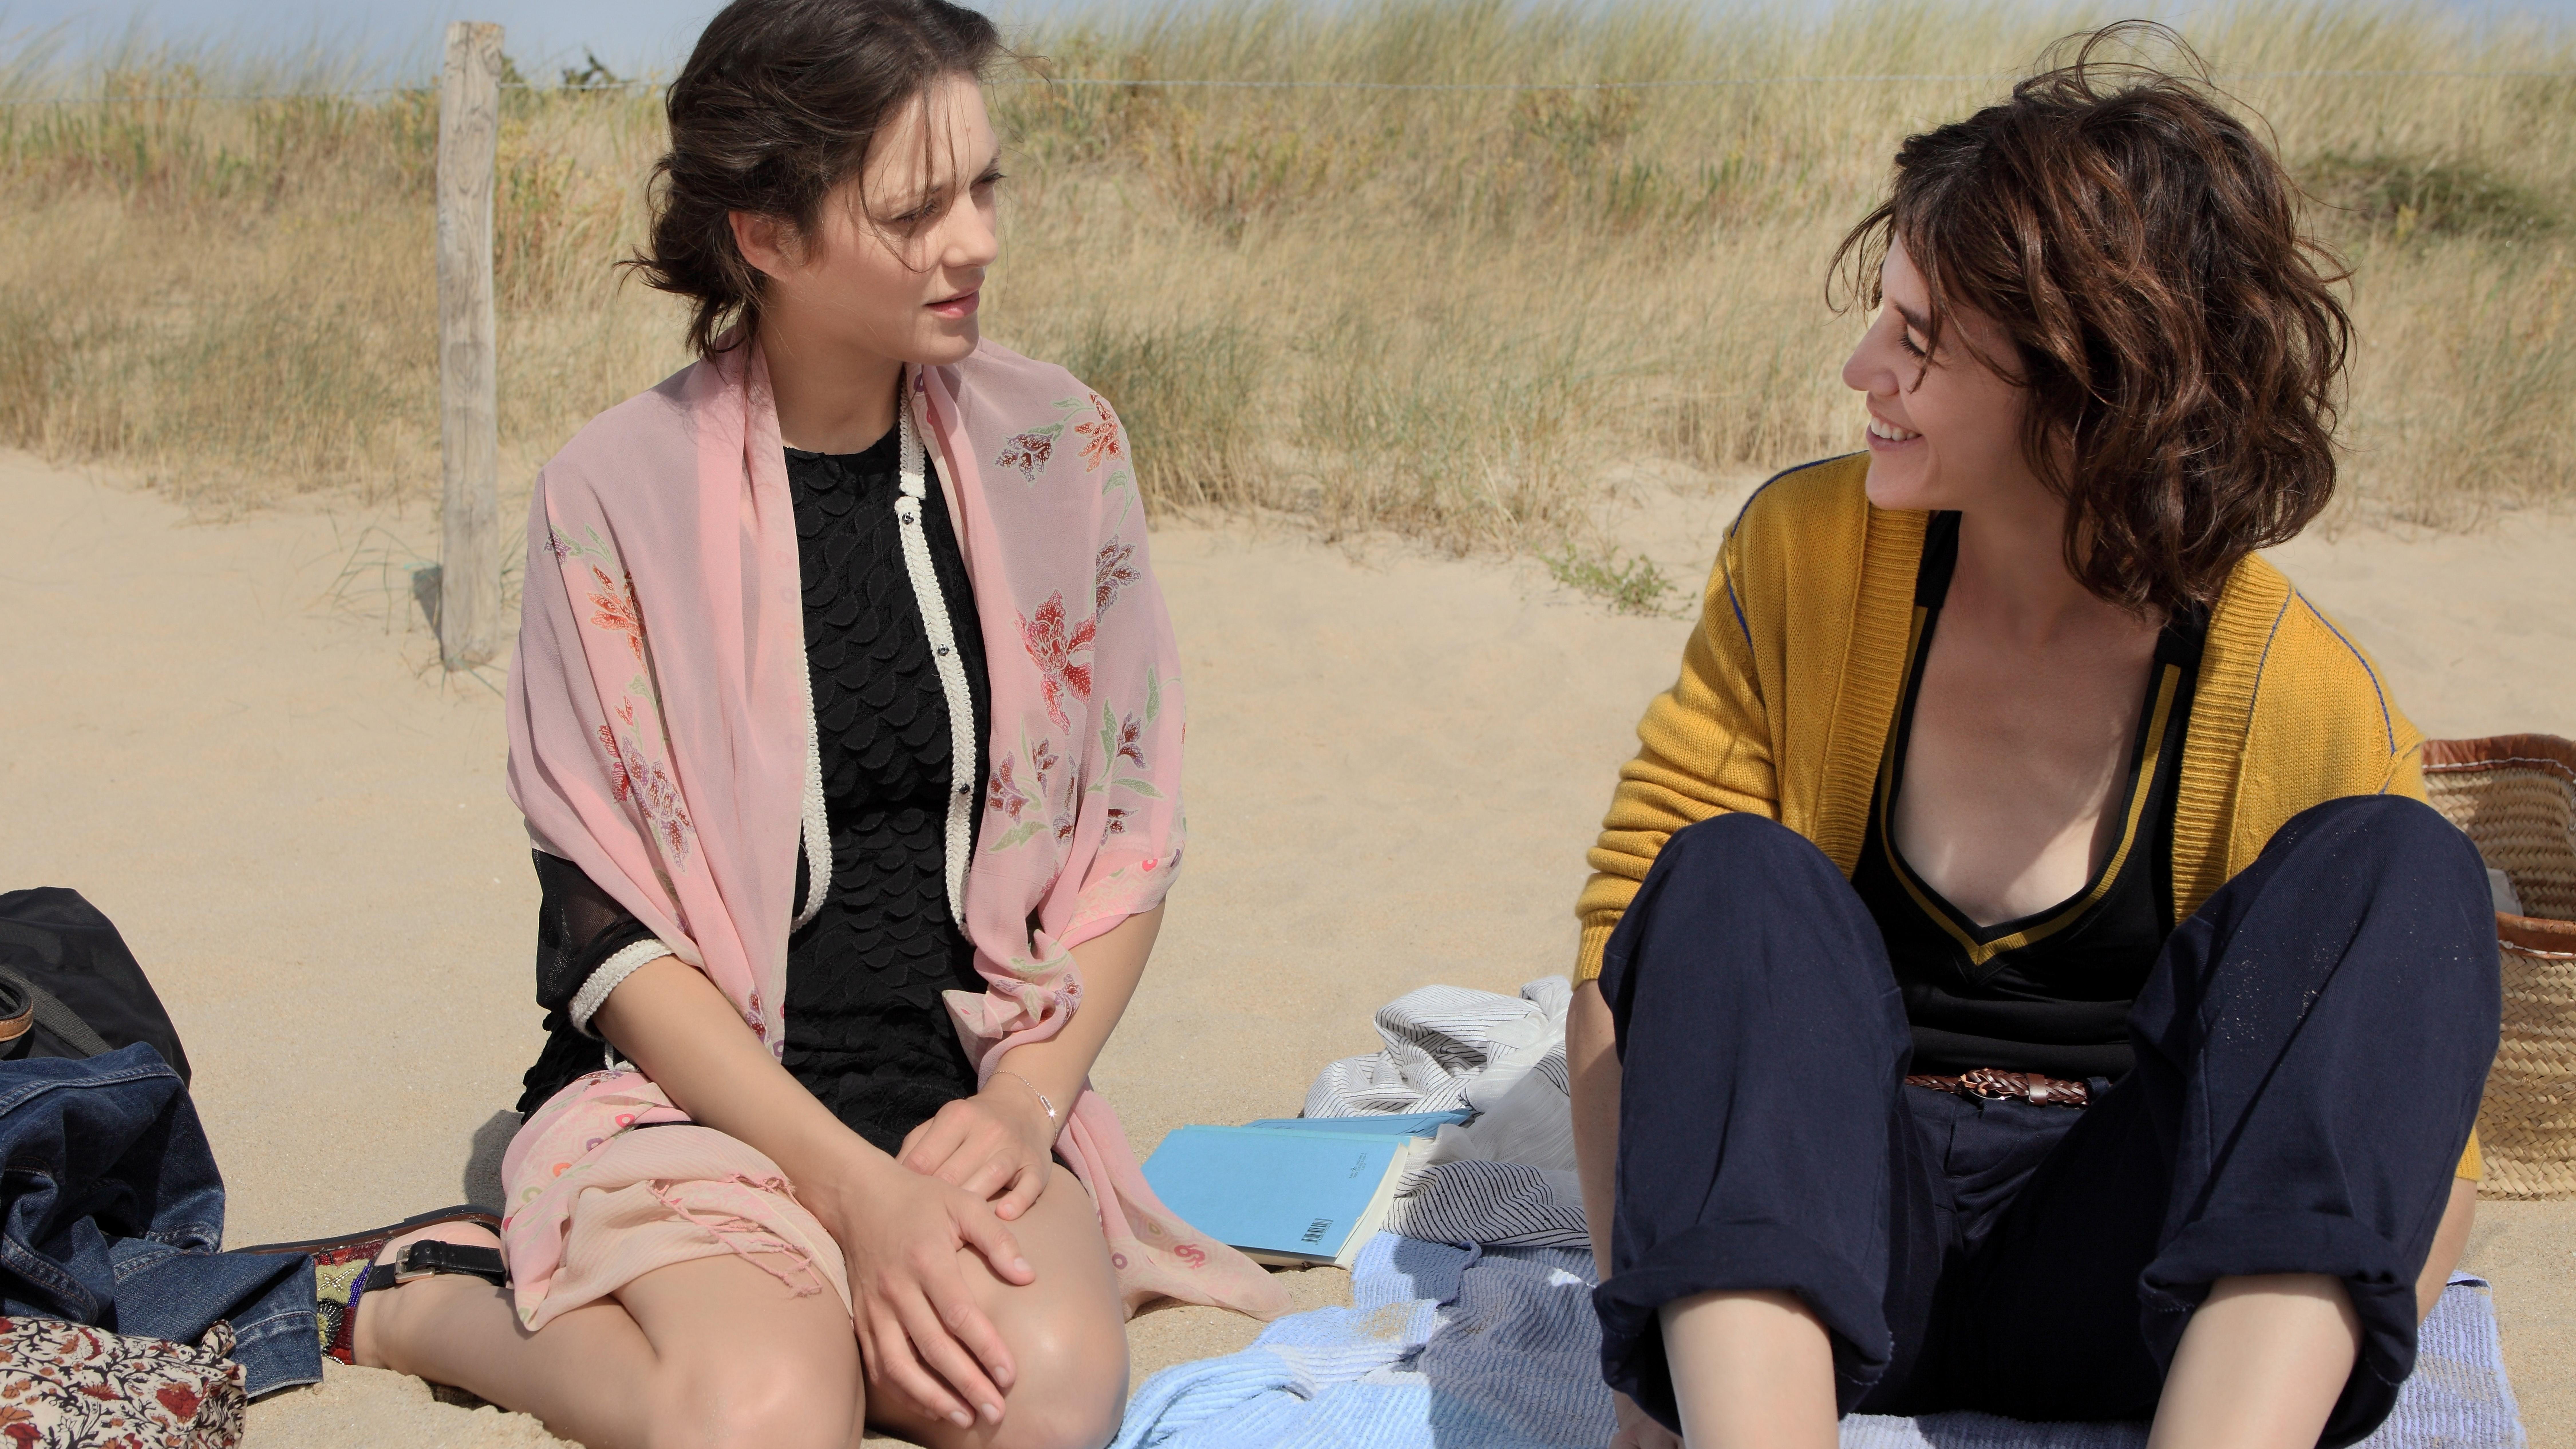 Призраки исмаэля full movie free watch online